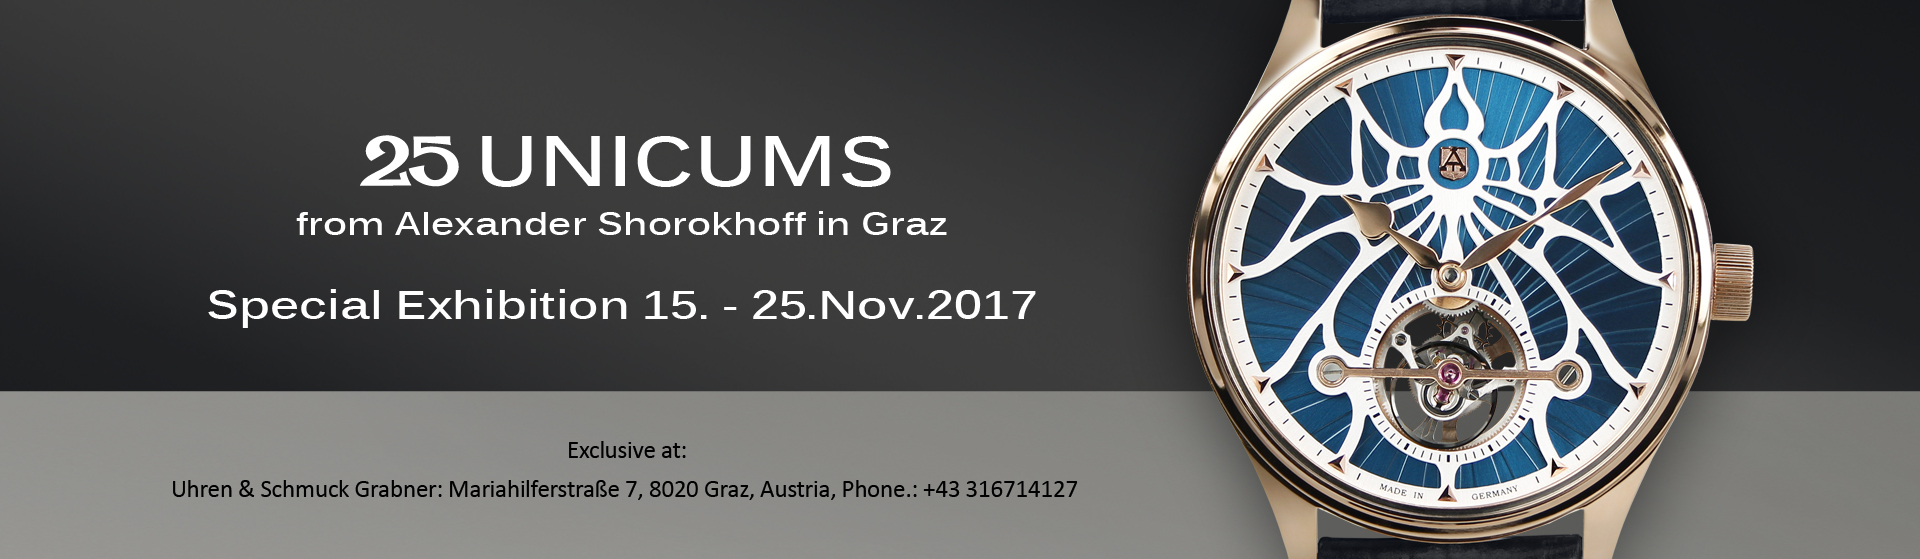 unicums alexander shorokhoff watches